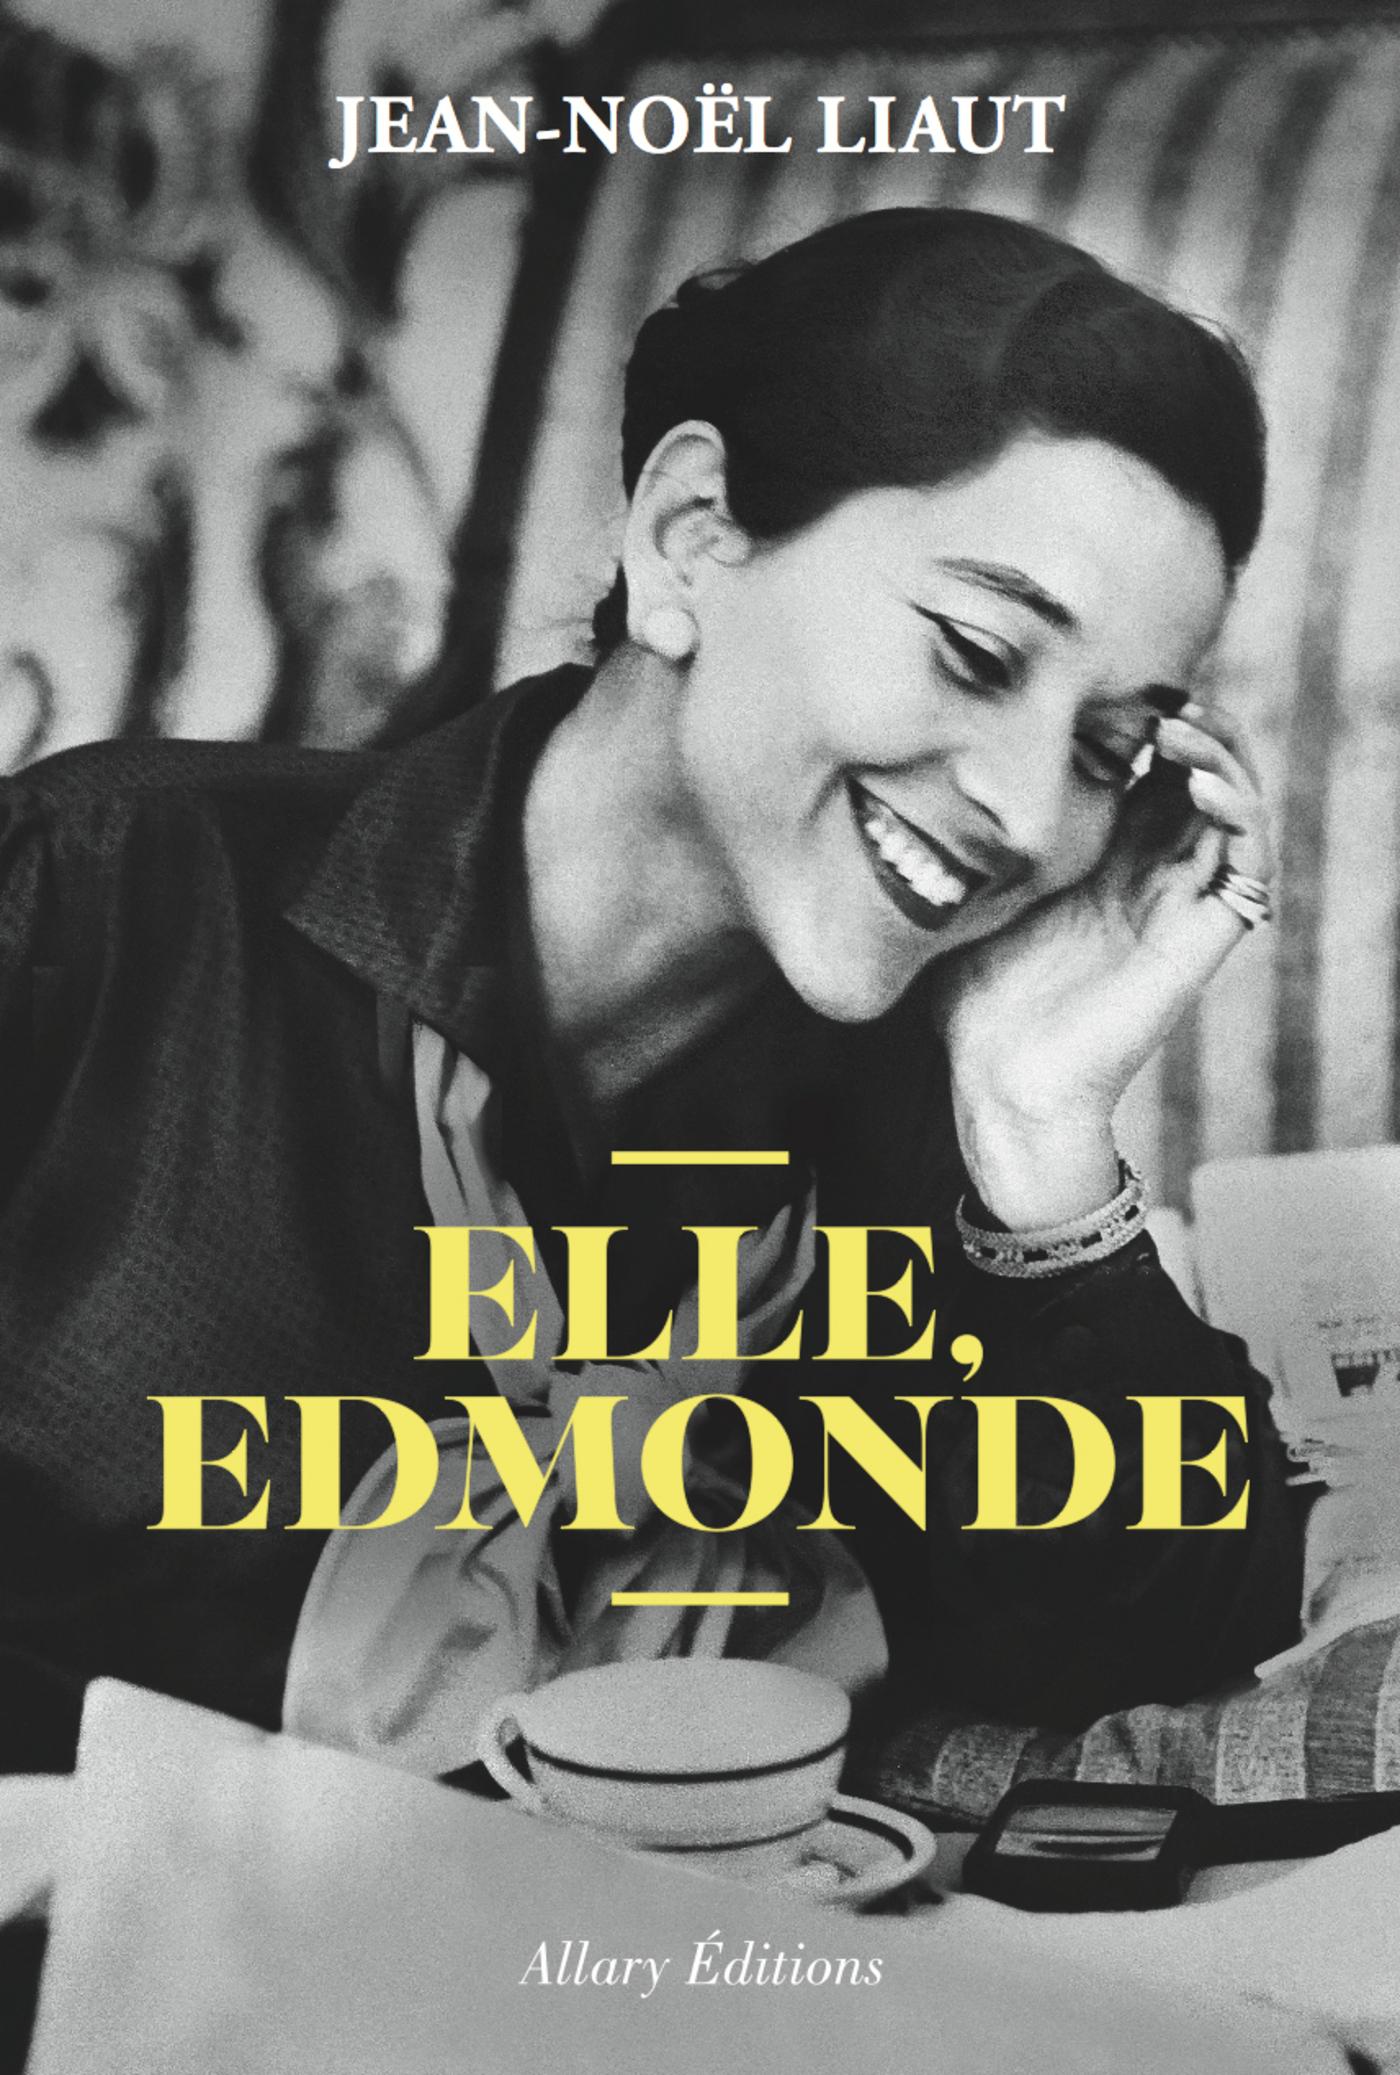 Elle, Edmonde